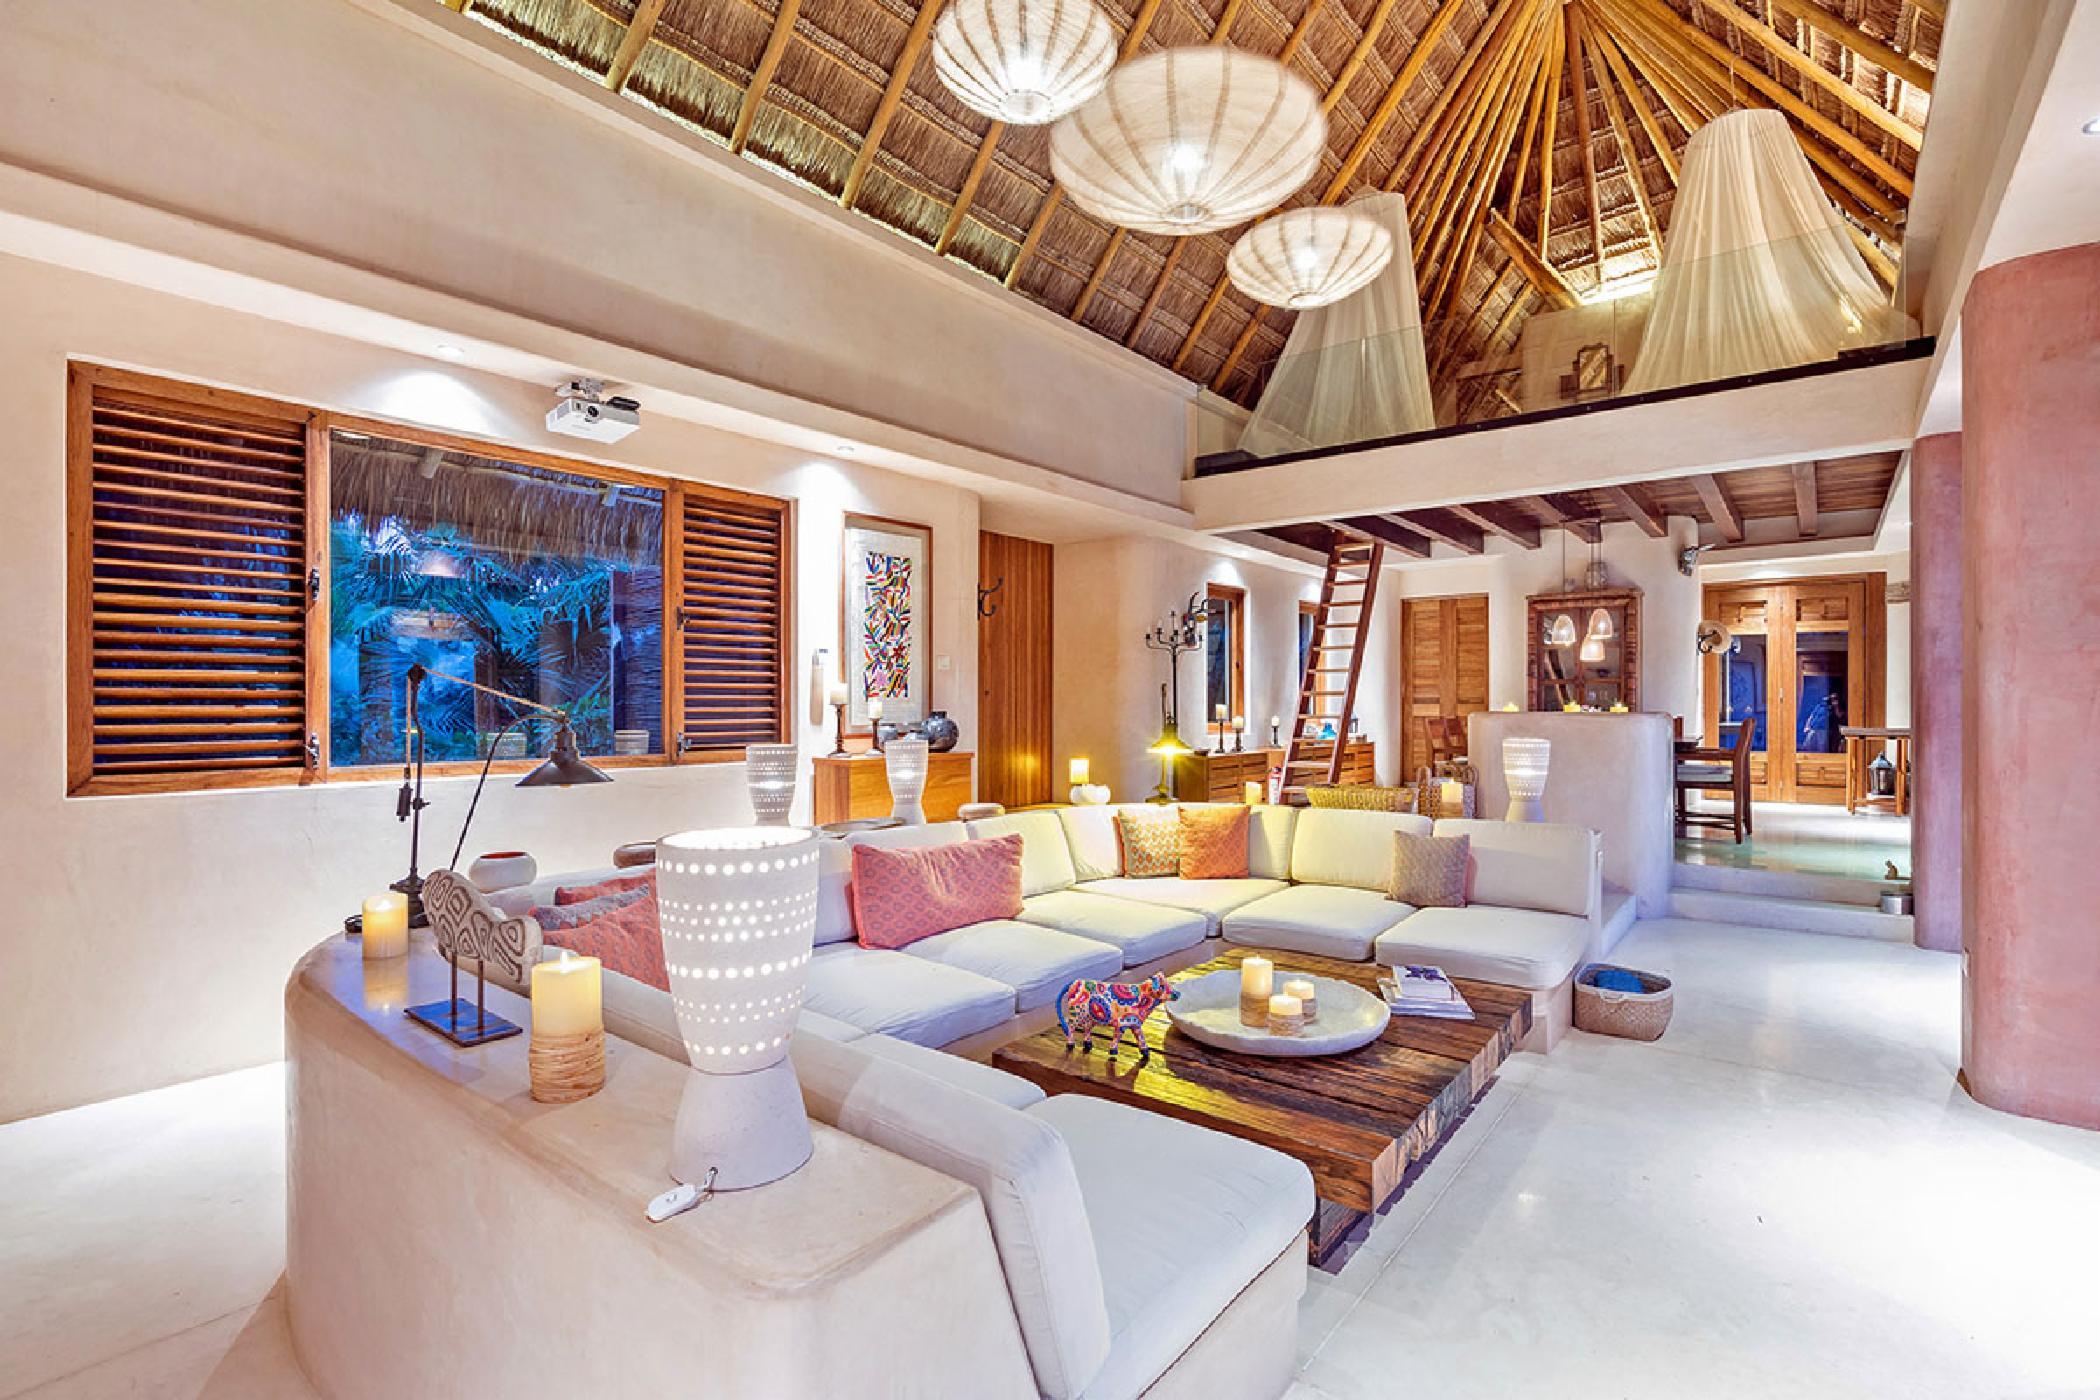 Maya_Luxe_Riviera_Maya_Luxury_Villas_Experiences_Sian_Kaan_Tulum_4_Bedrooms_Casa_Cantarena_16.jpg